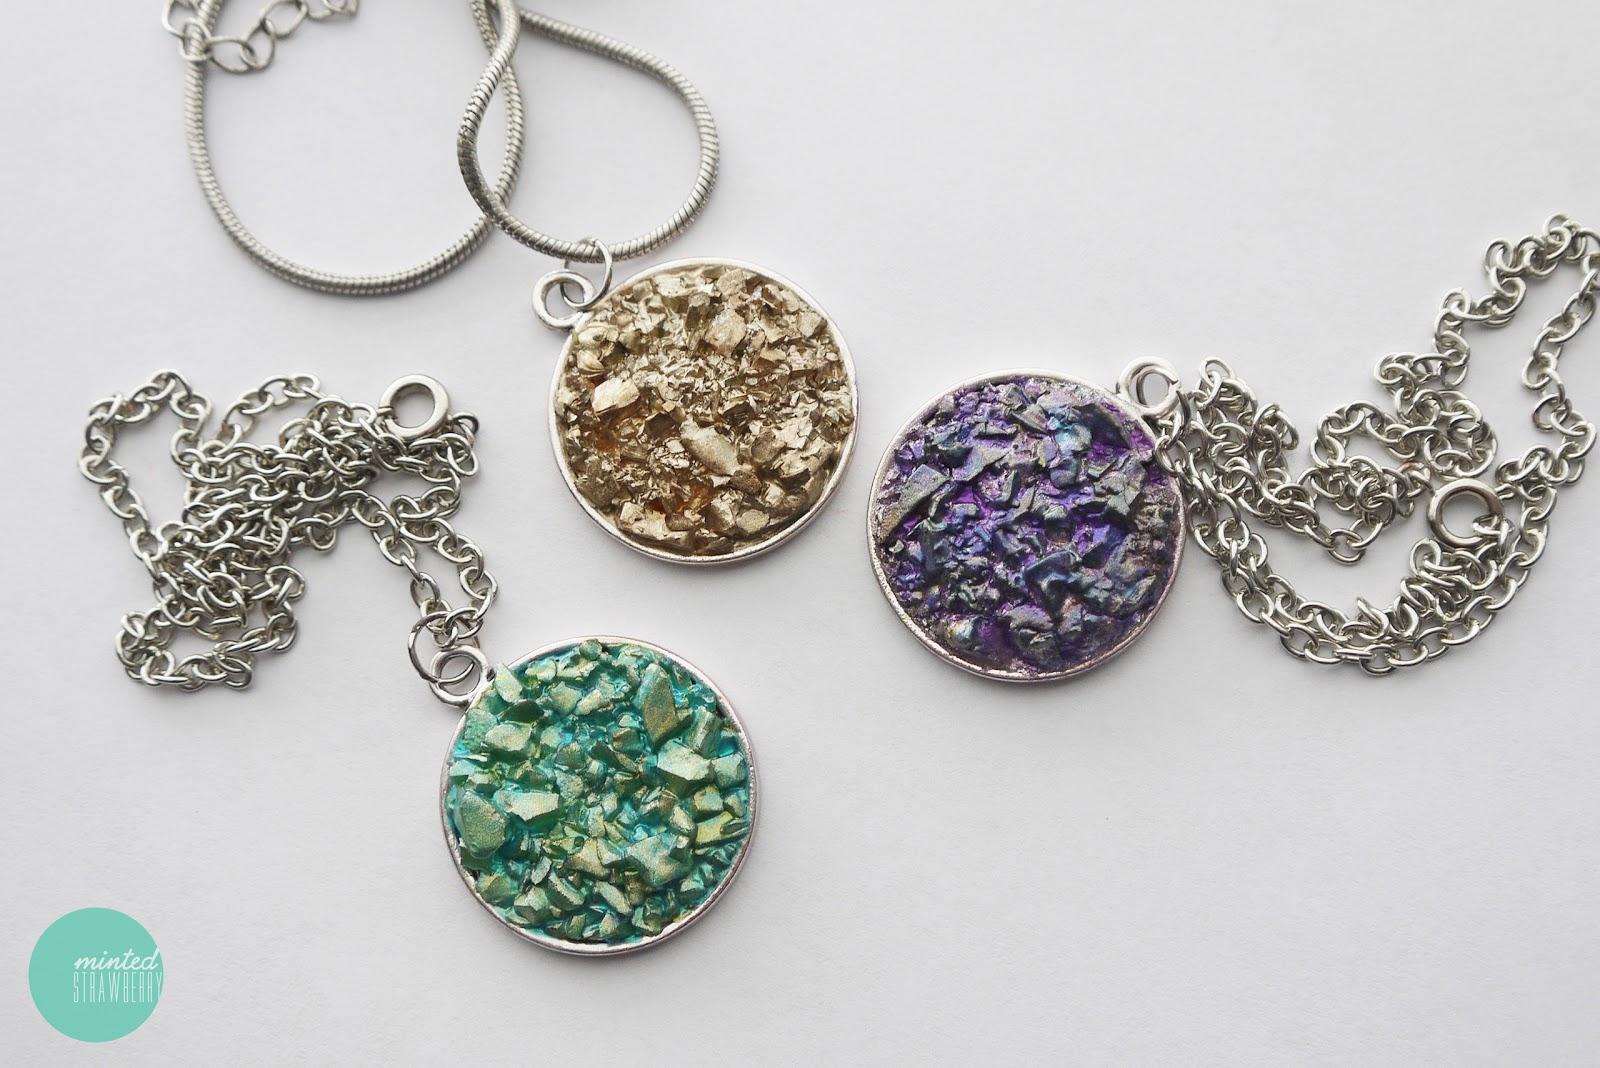 diy necklace pendant - photo #38